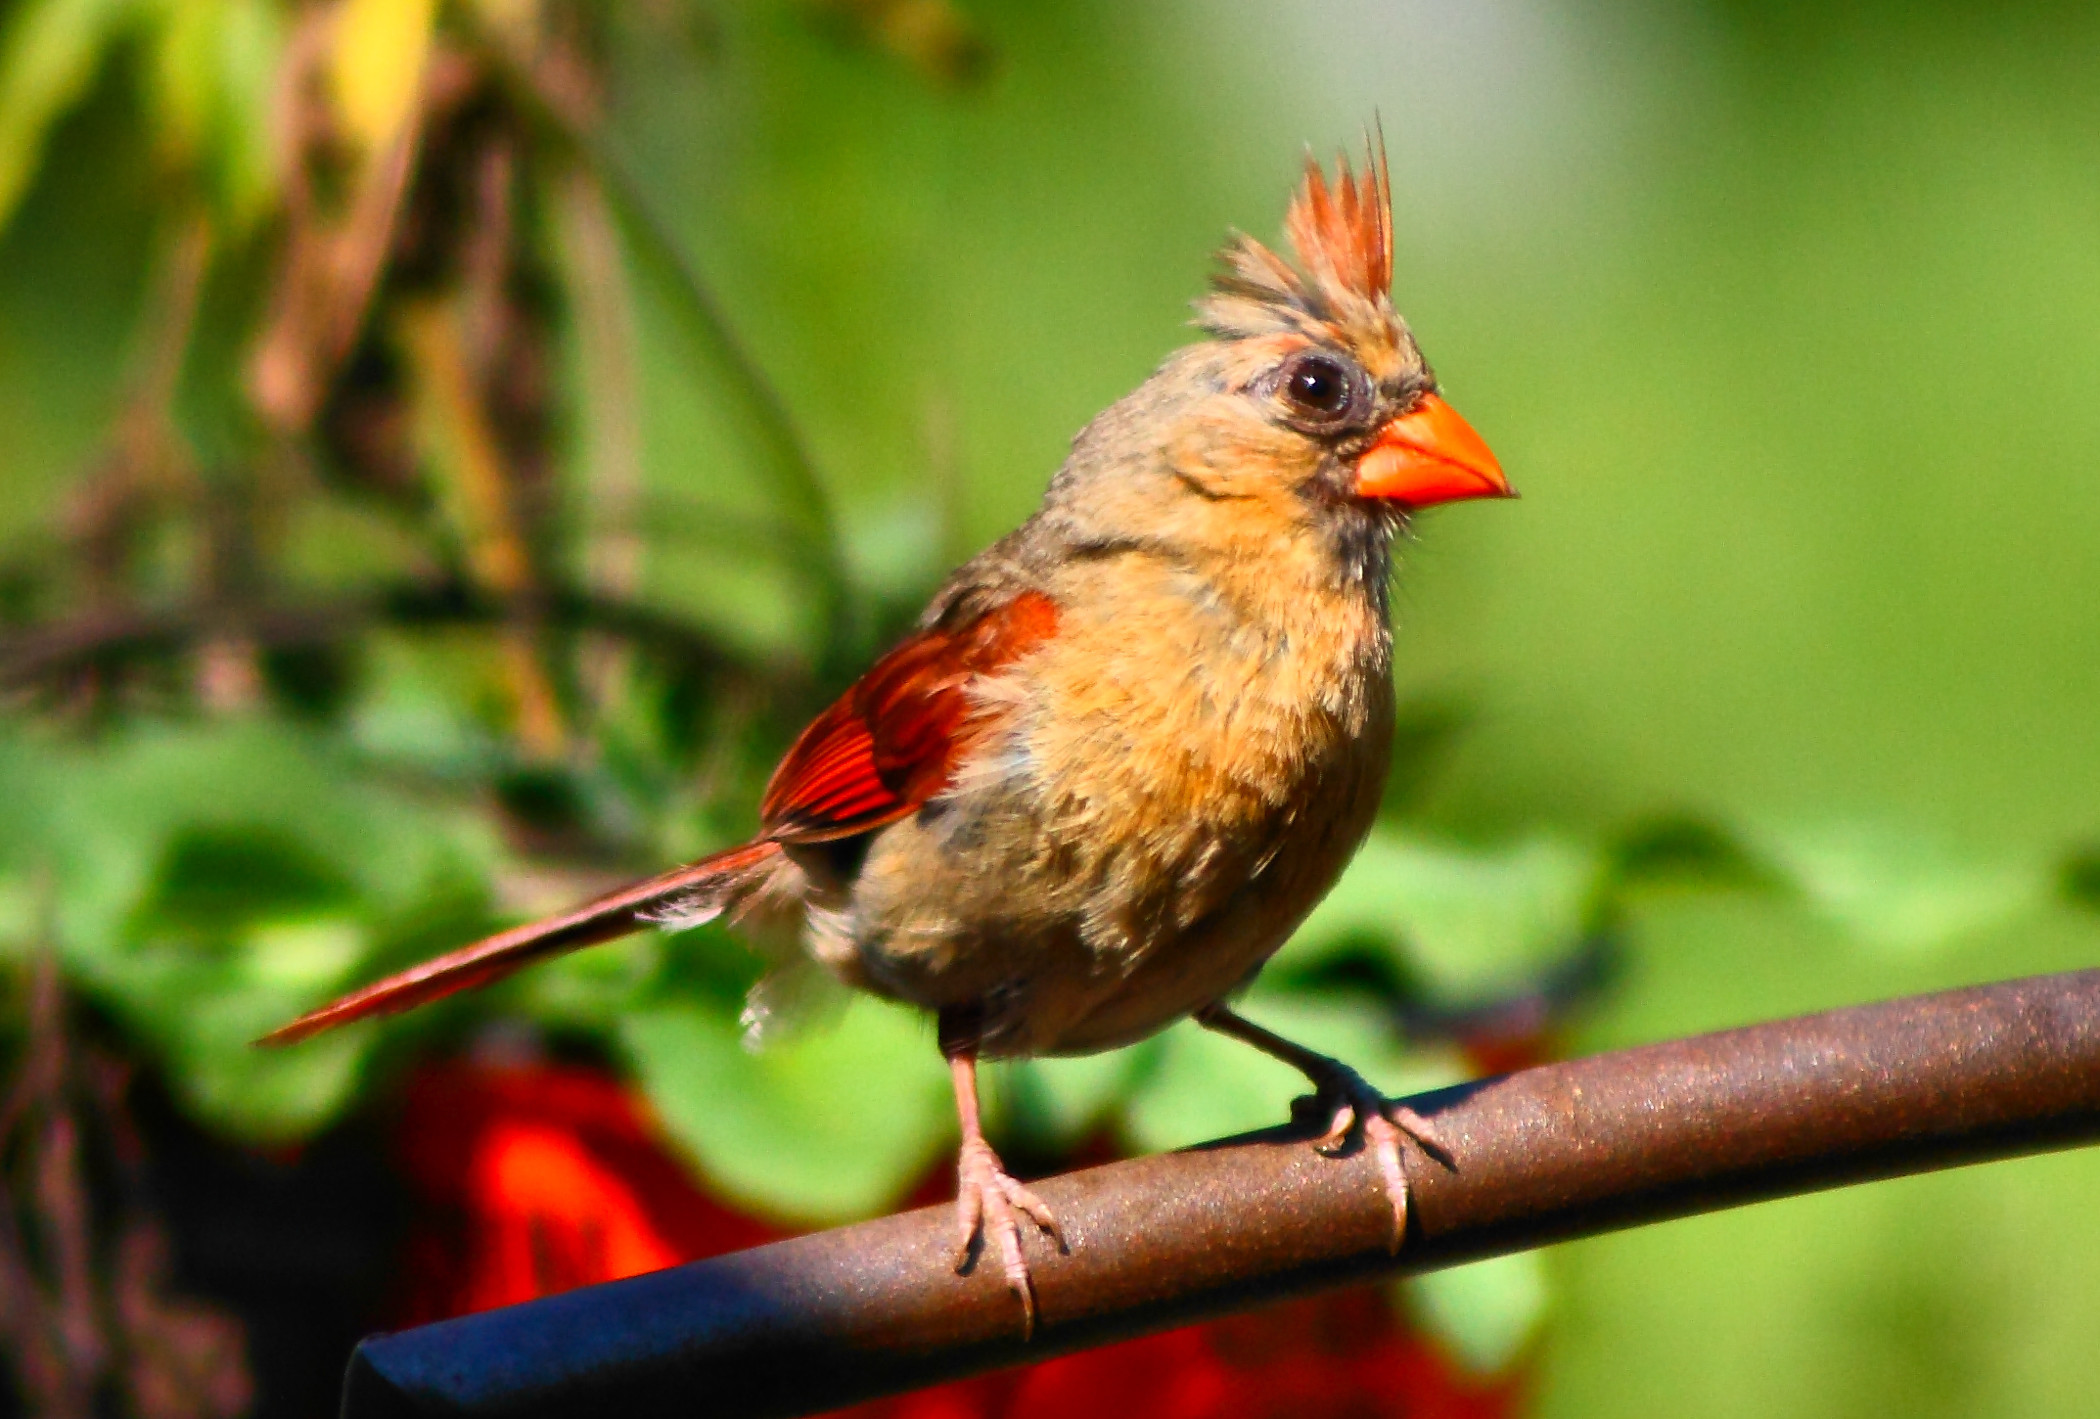 Best Iphone Wallpapers Female Cardinal Birds